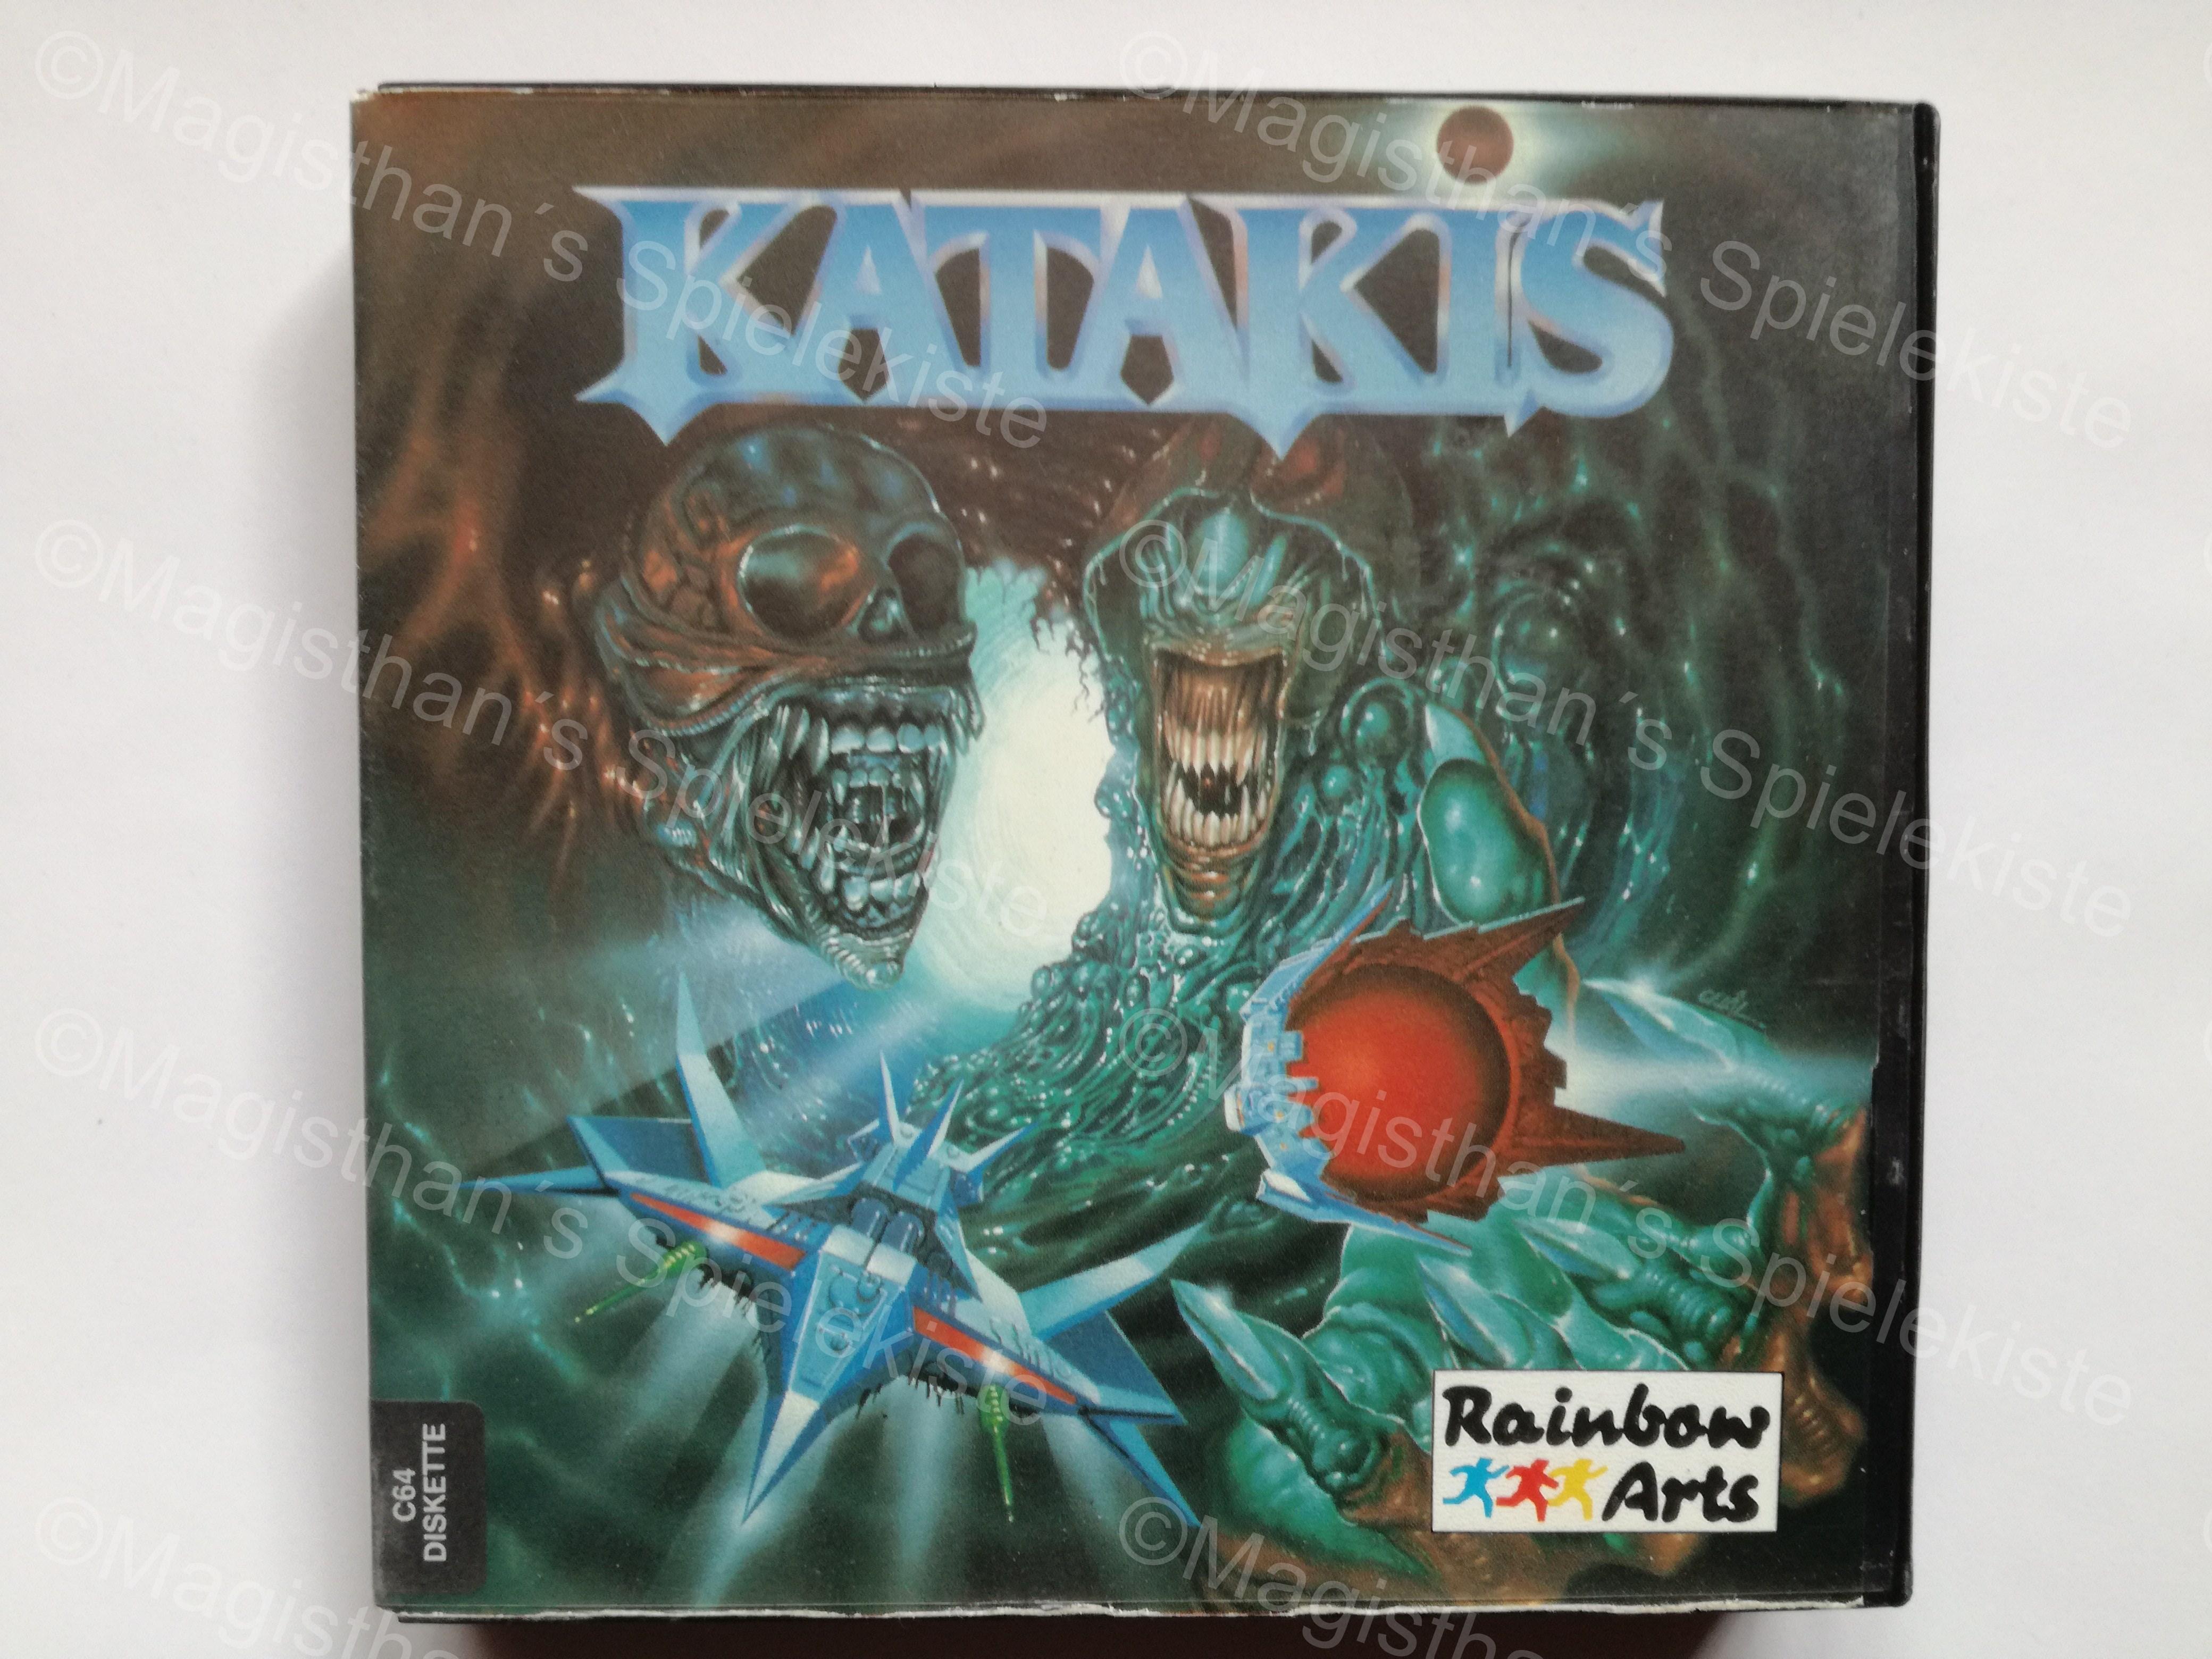 KatakisC64_1.jpg